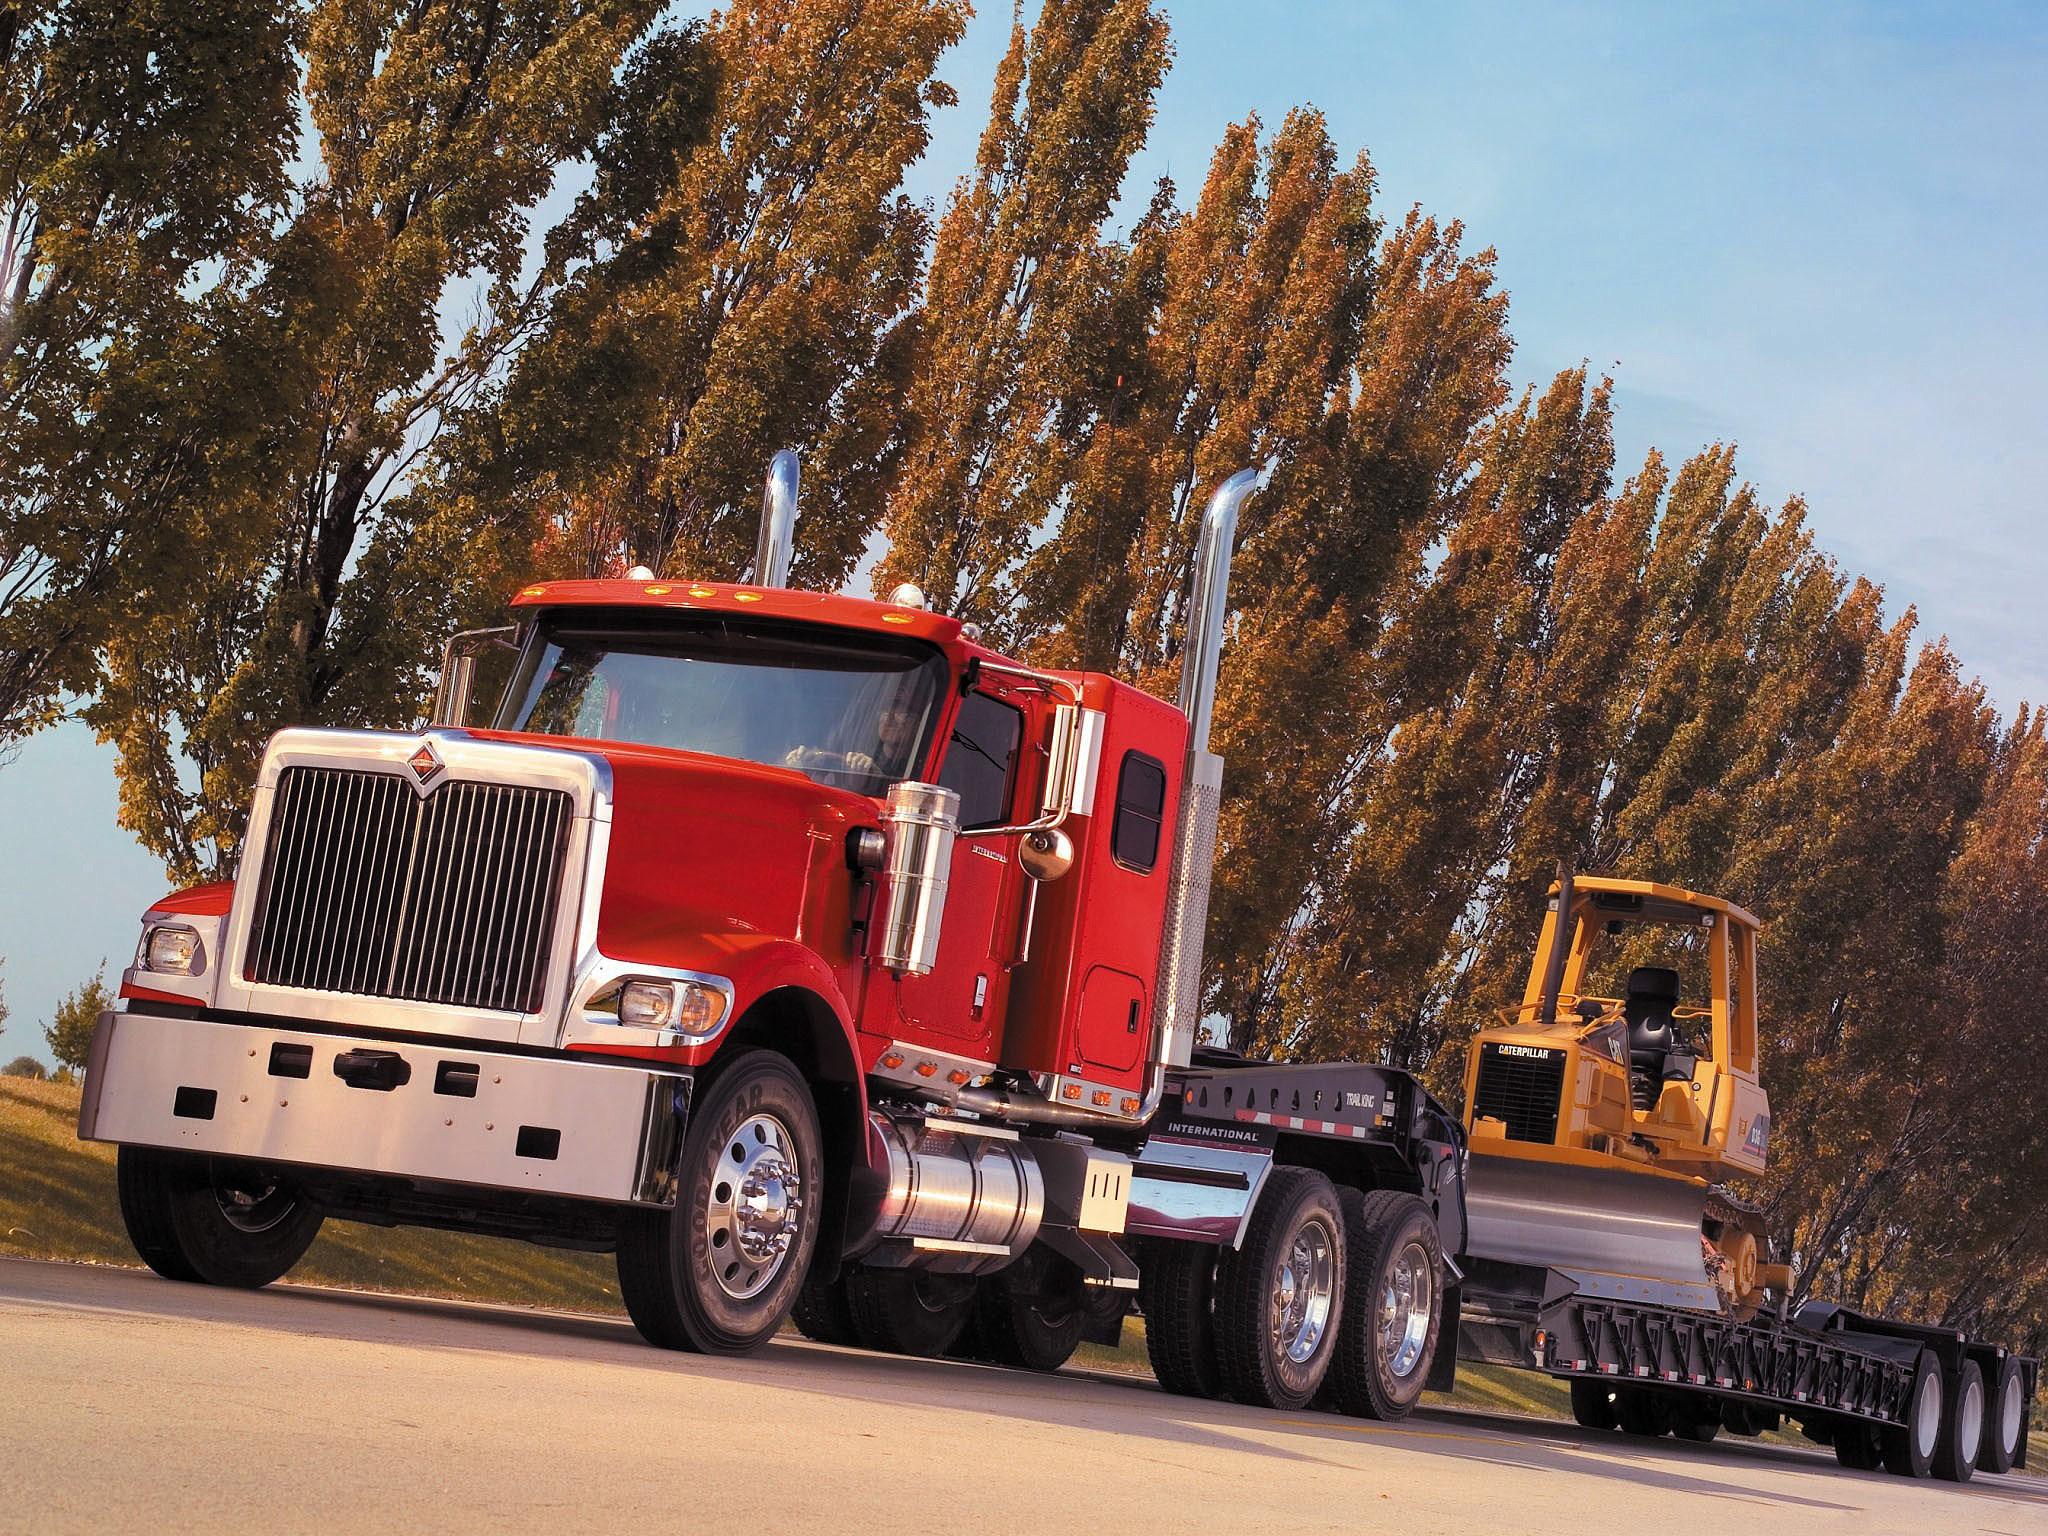 Download High quality Trucks wallpaper / Vehicles / 2048x1536